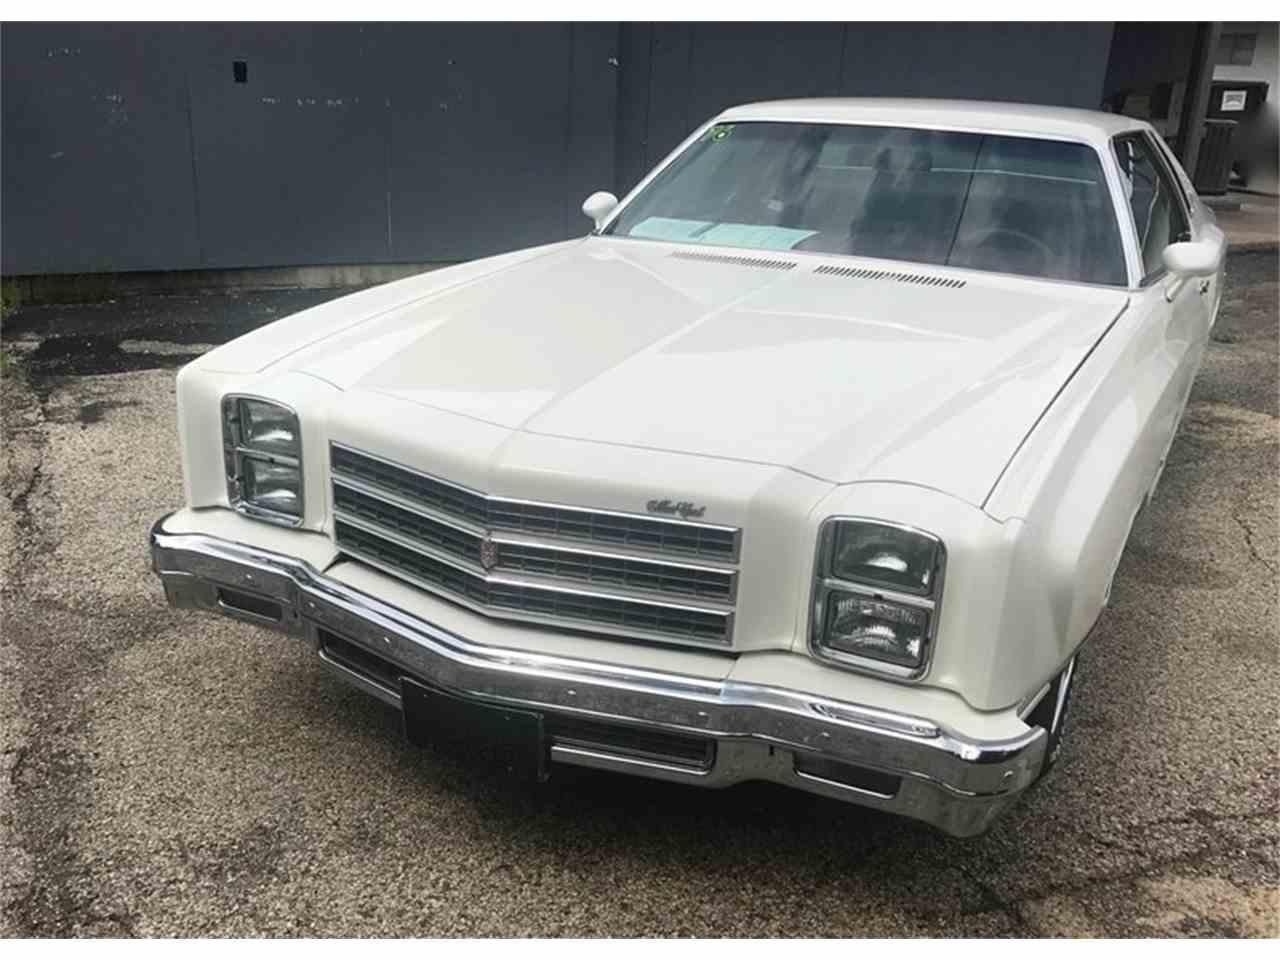 Chevy Dealers Dayton Ohio >> 1976 Chevrolet Monte Carlo for Sale | ClassicCars.com | CC-987551